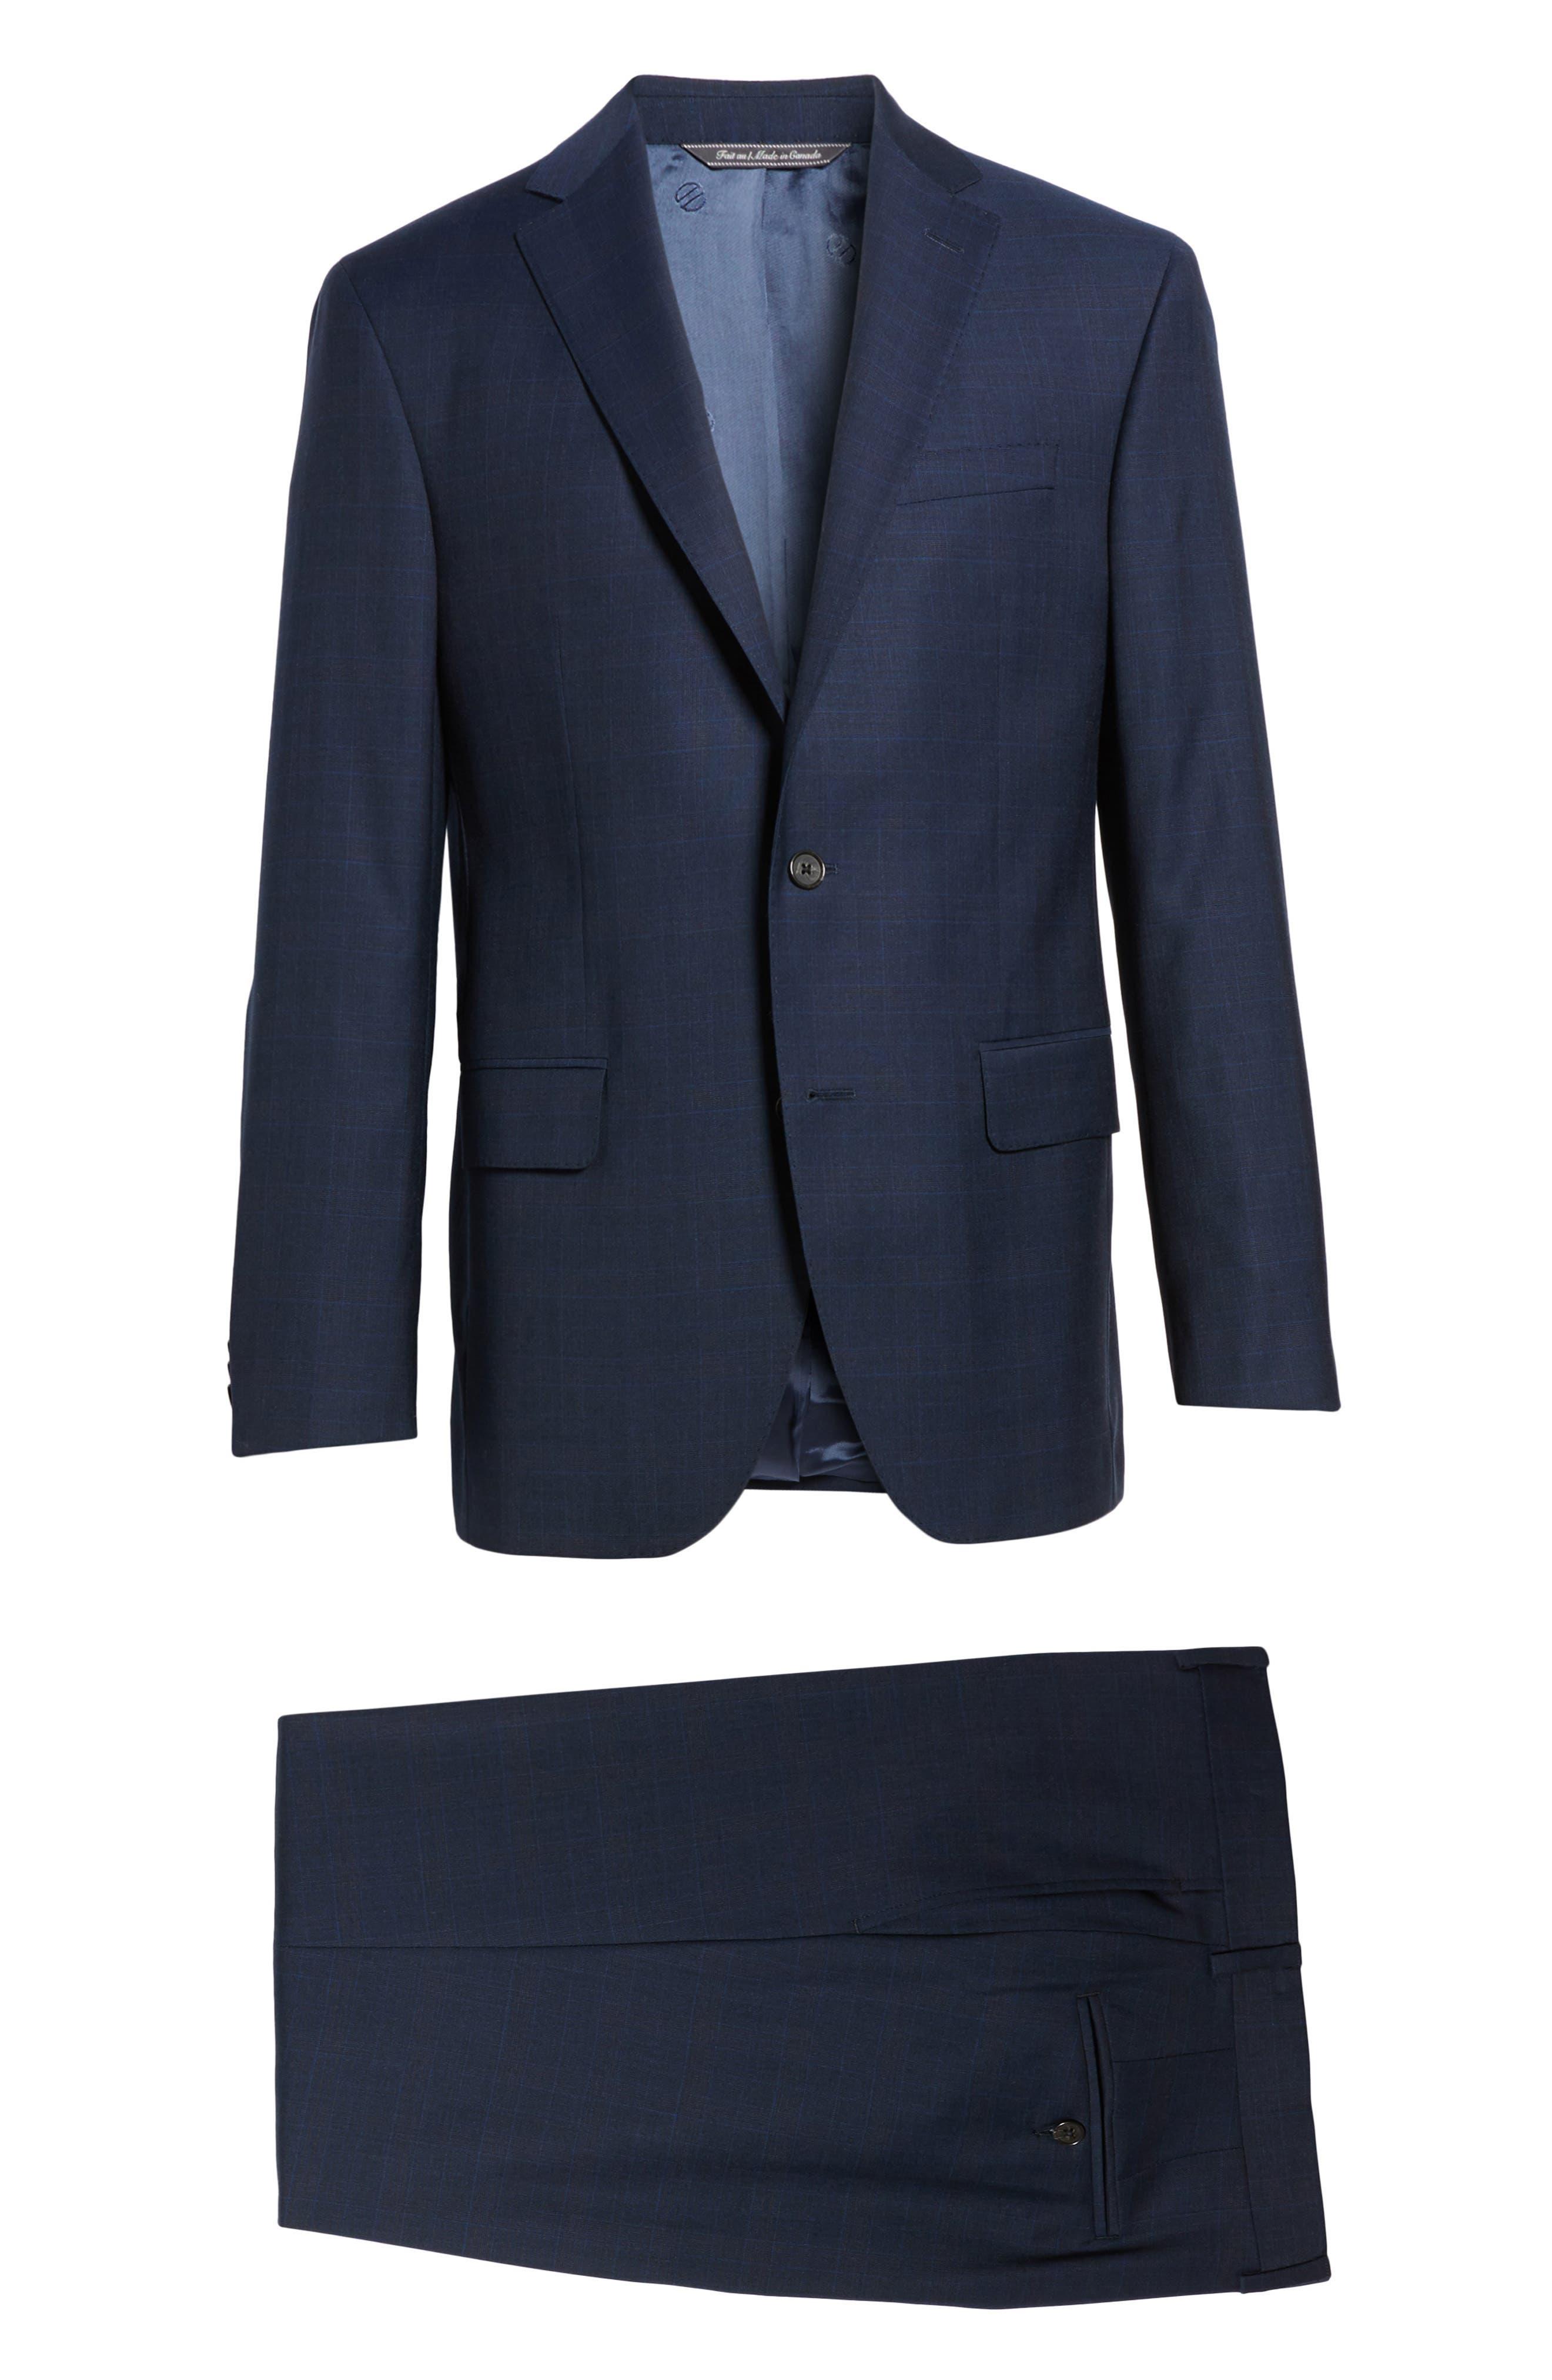 Ryan Classic Fit Plaid Wool Suit,                             Alternate thumbnail 8, color,                             Navy